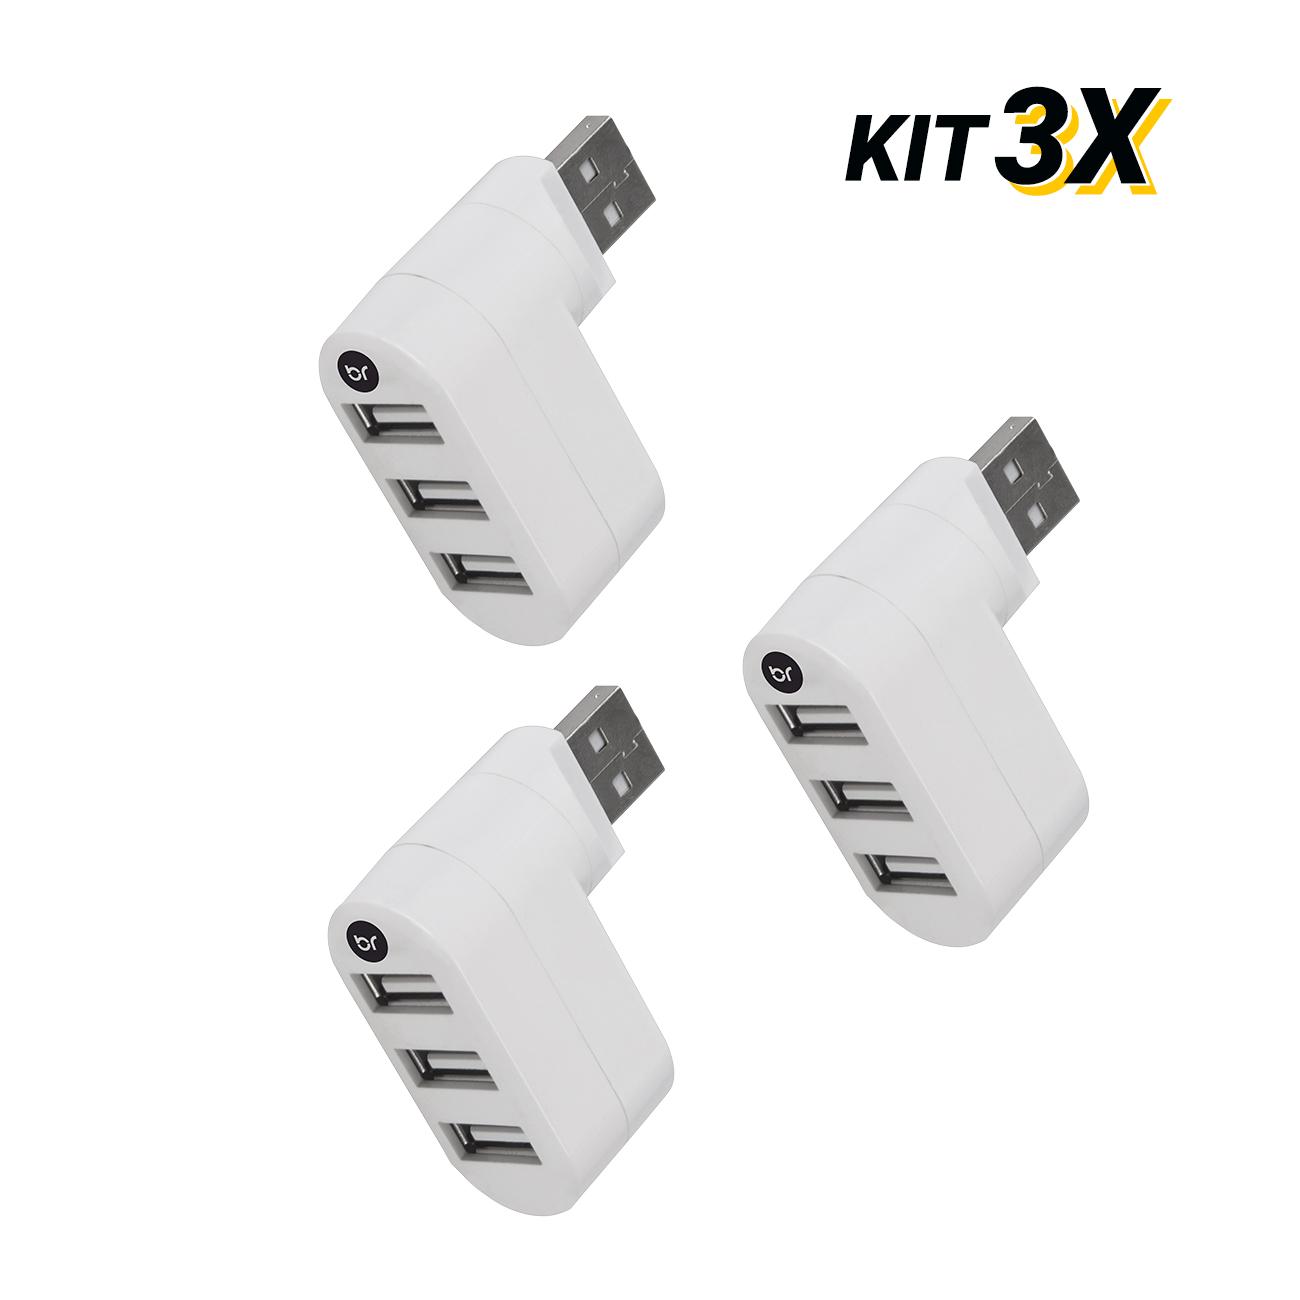 Kit 3 Mini Hub Usb Conector Giratório Com 3 Portas 2.0 Fast